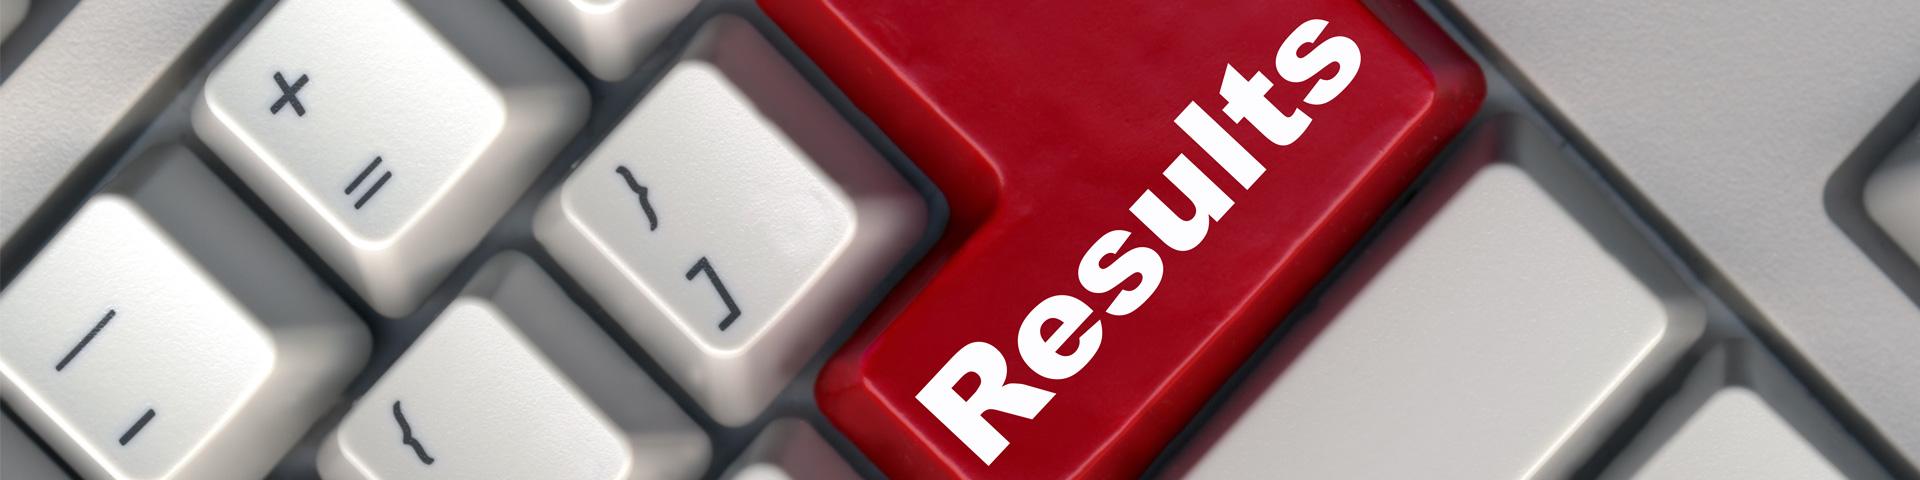 Оптимизация - Високи Резултати